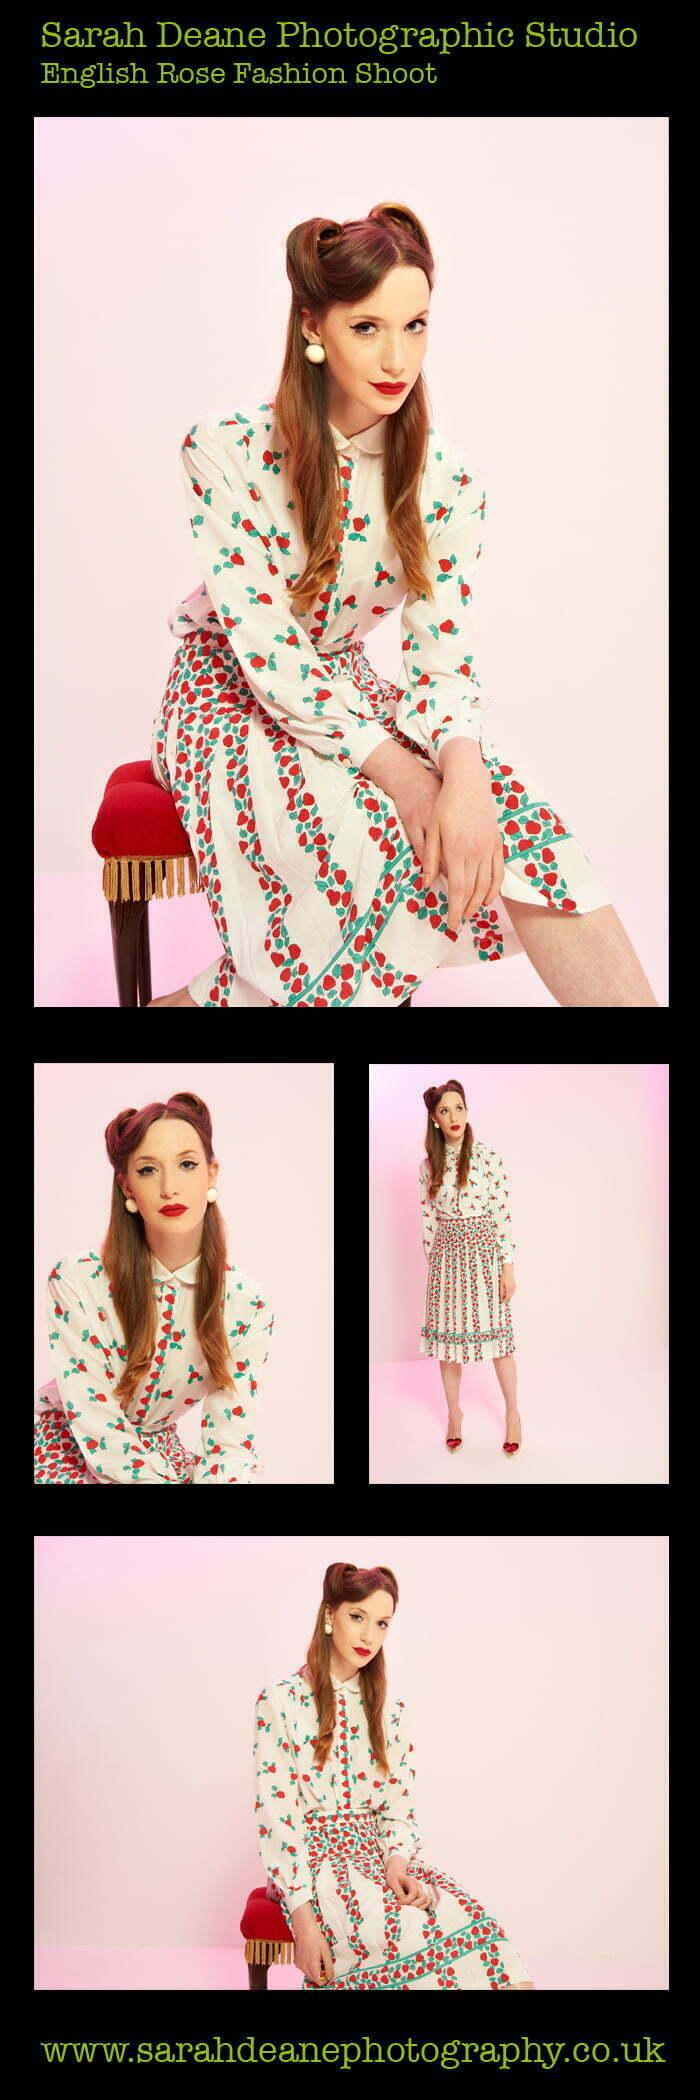 English Rose fashion shoot at newcastle fashion studio